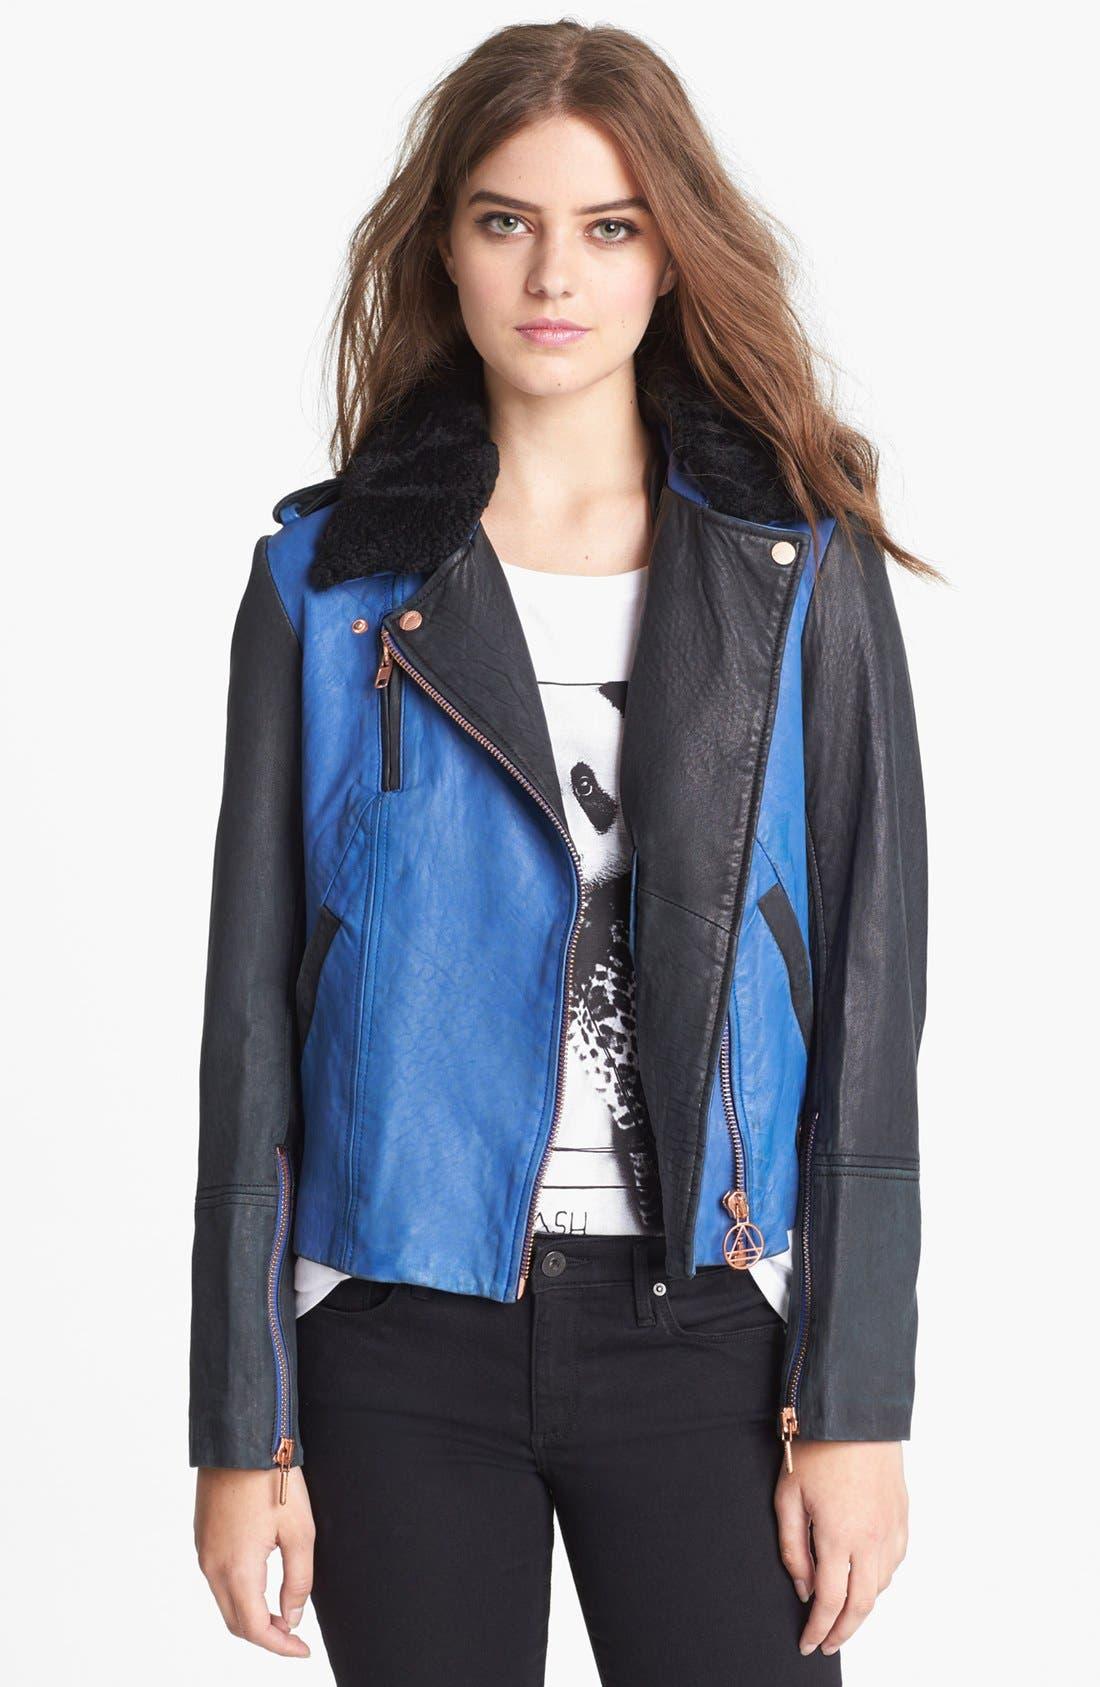 Main Image - ELEVENPARIS 'Trinite' Leather Jacket